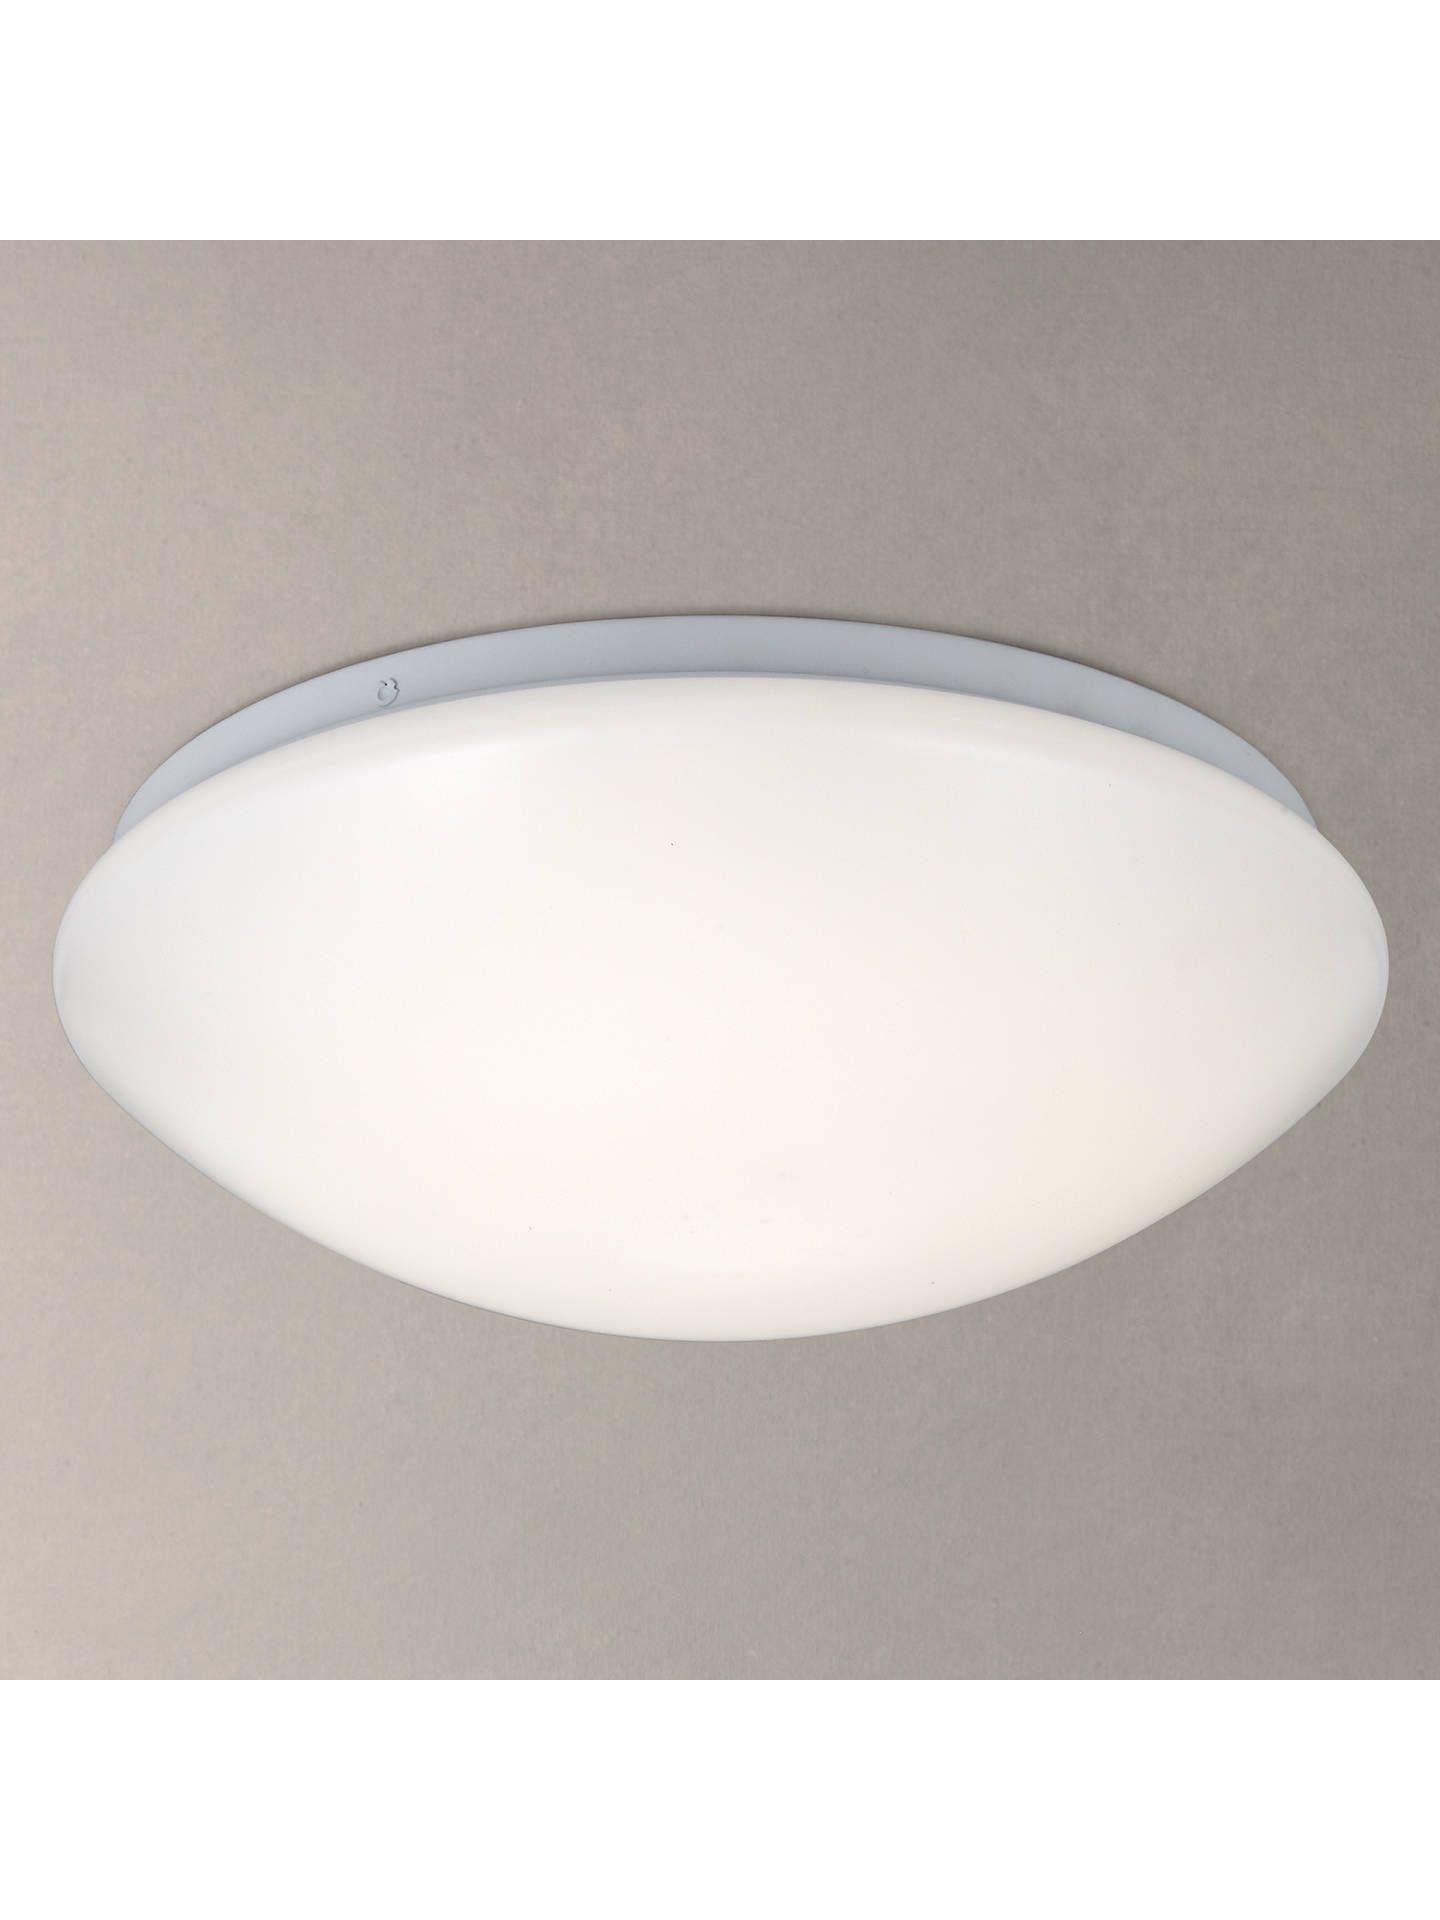 John Lewis Partners Saint Led Flush Bathroom Light Opal Bathroom Light Fittings Bathroom Lighting Flush Ceiling Lights